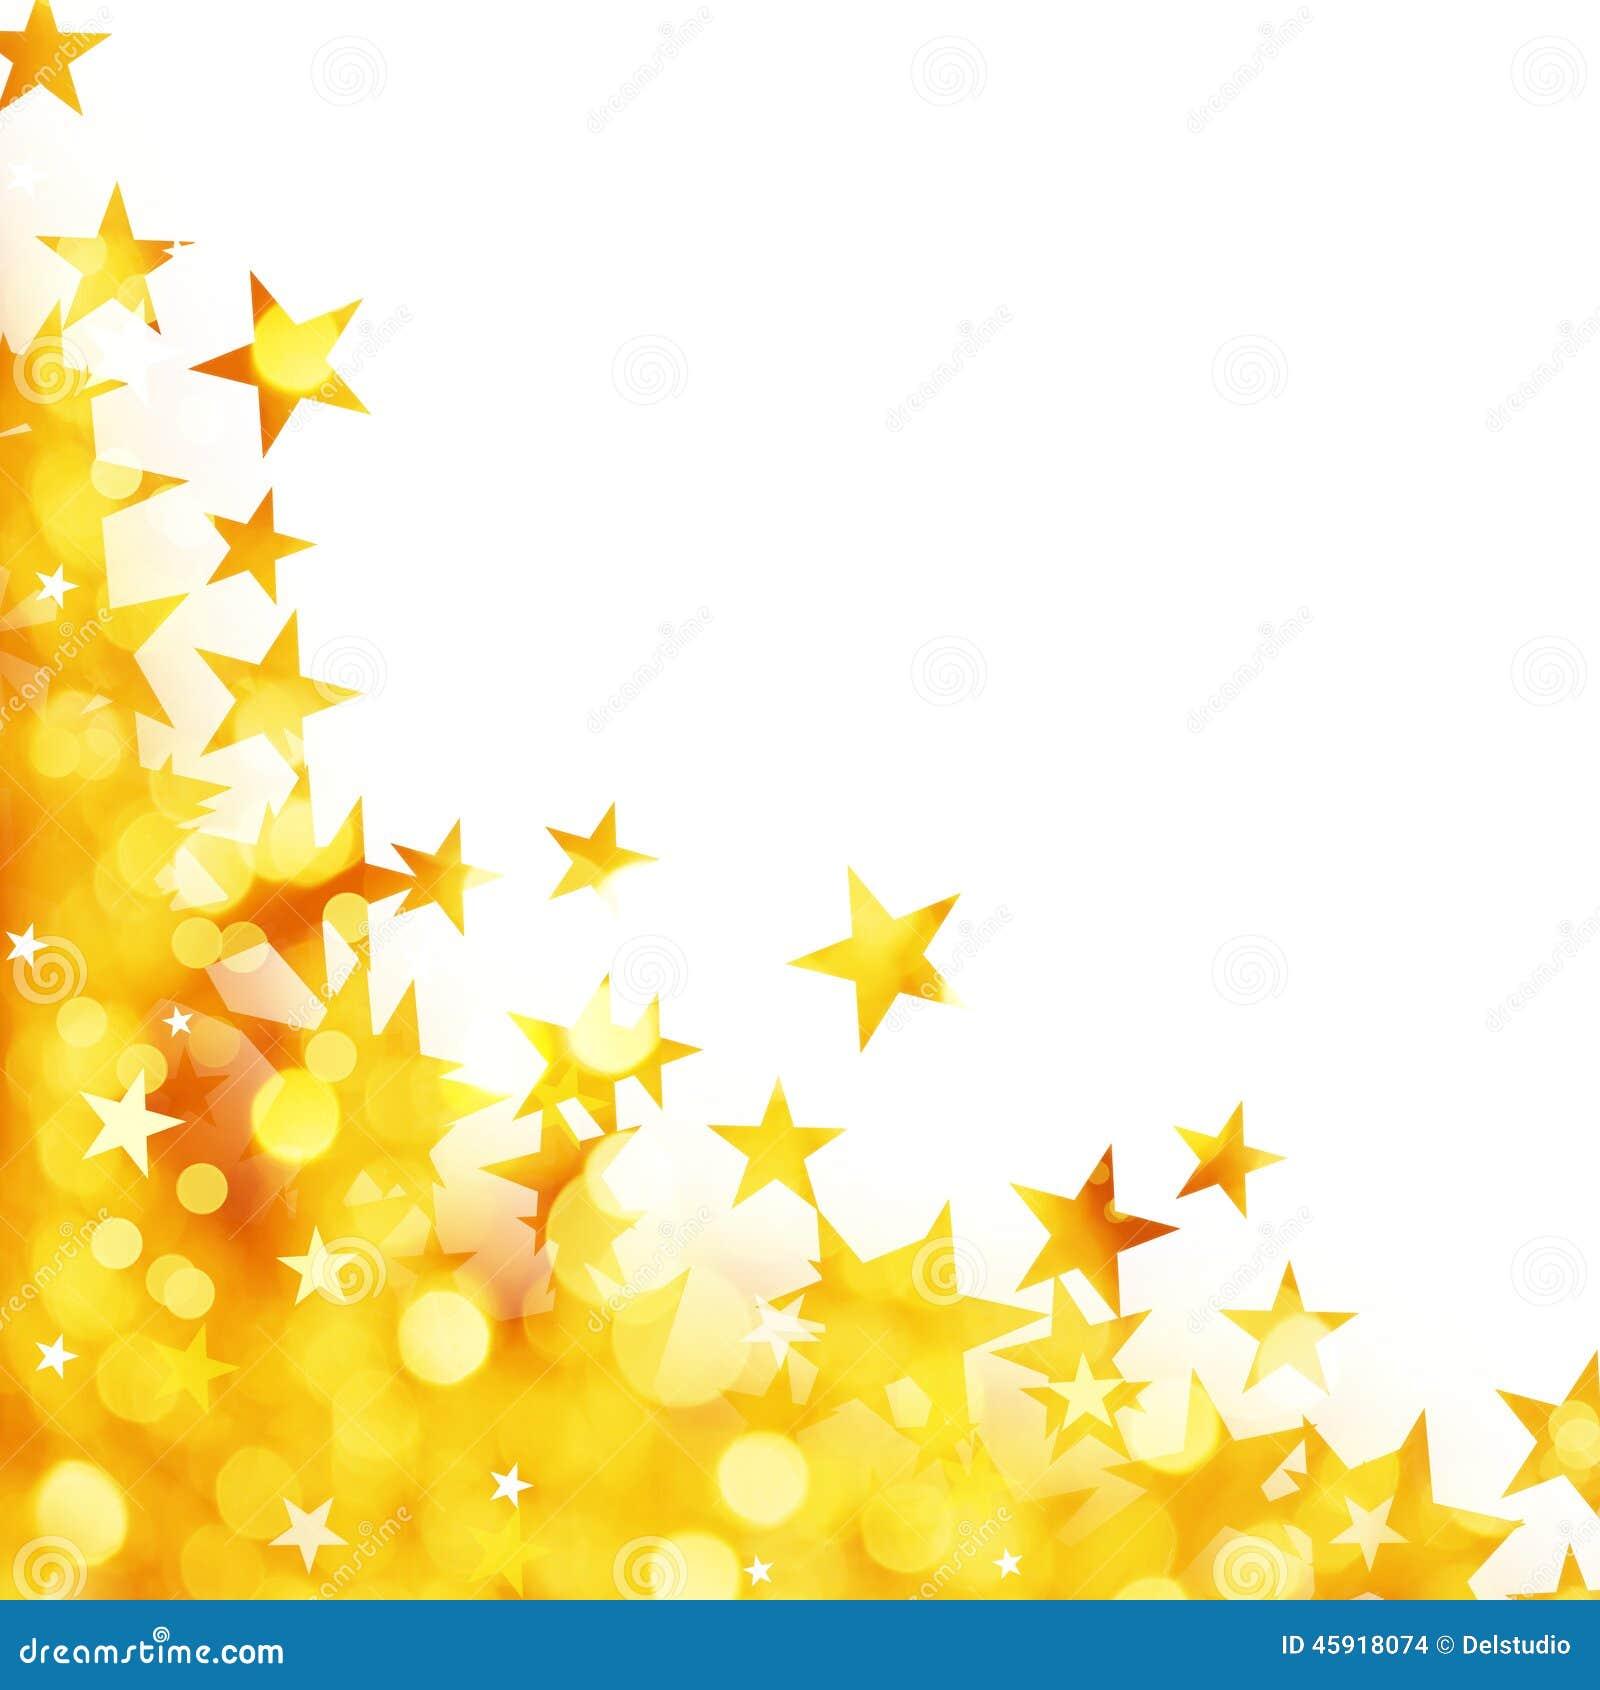 shiny golden lights stock - photo #11